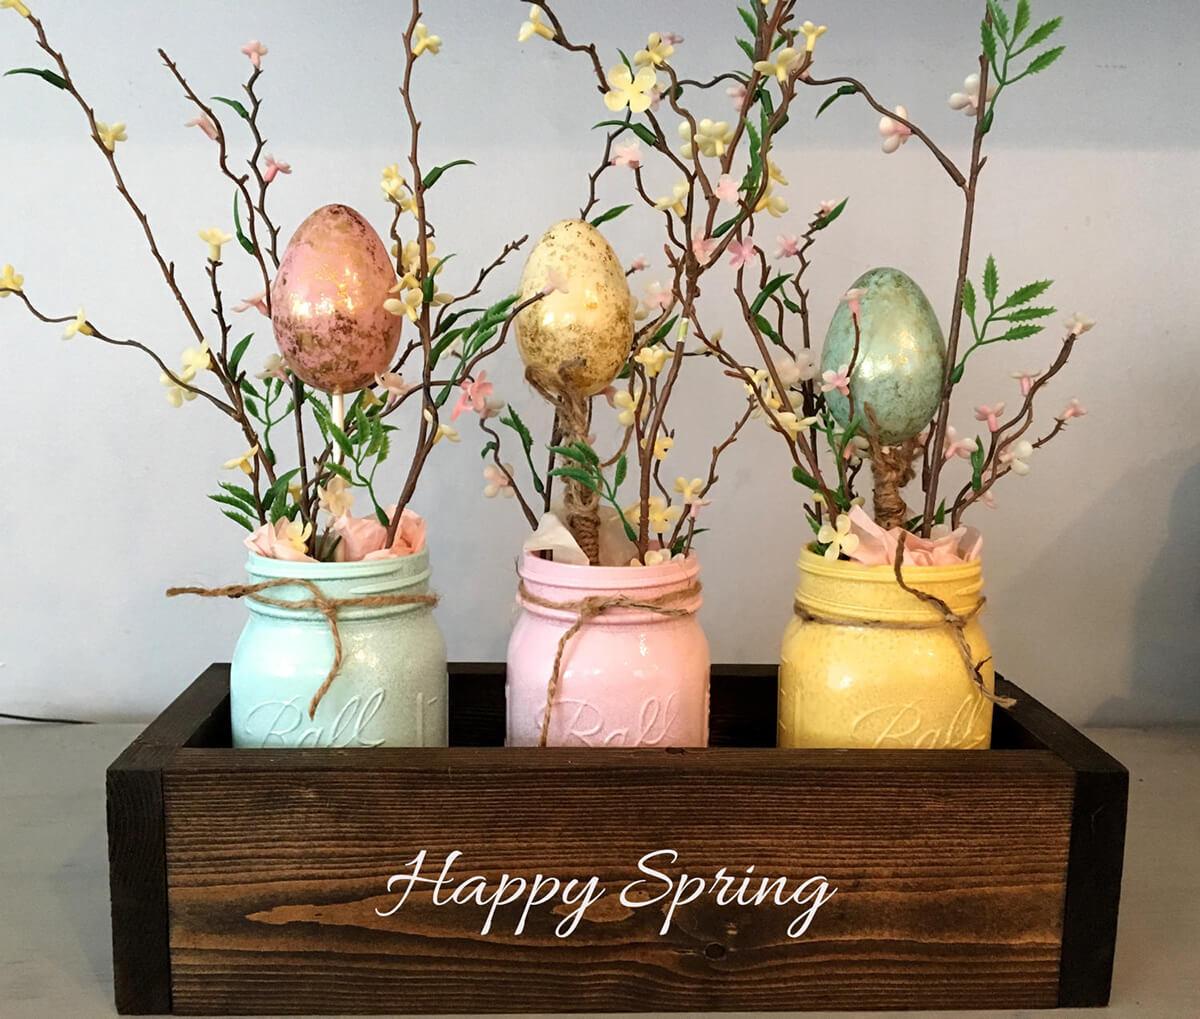 Planter Box Styled Spring Tree Centerpiece